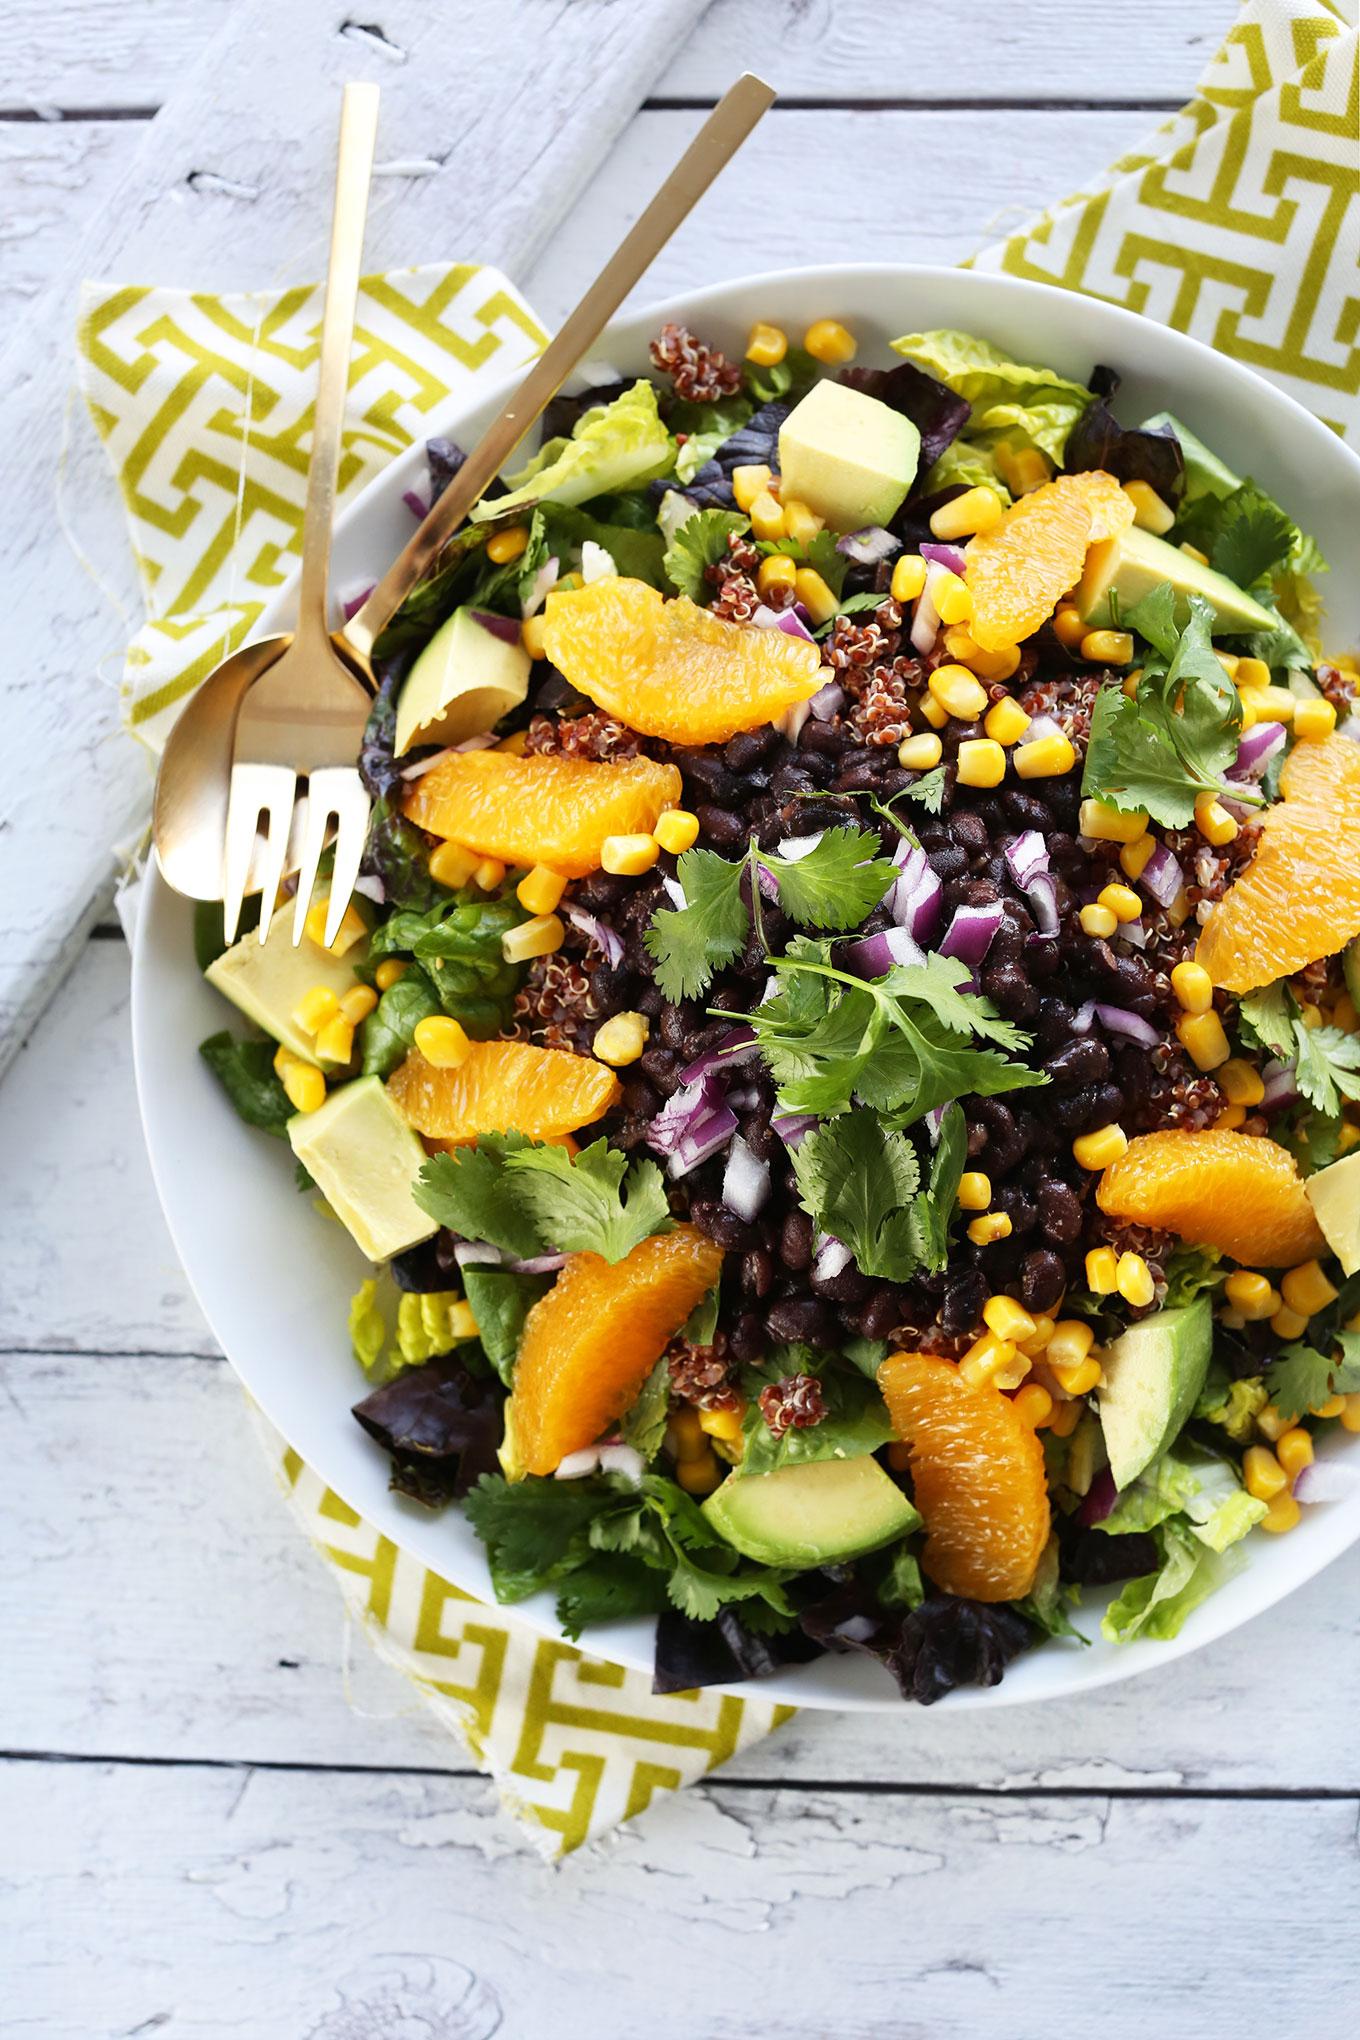 Quinoa Mexican Salad with Creamy Orange Chili Dressing! #vegan #glutenfree #minimalistbaker